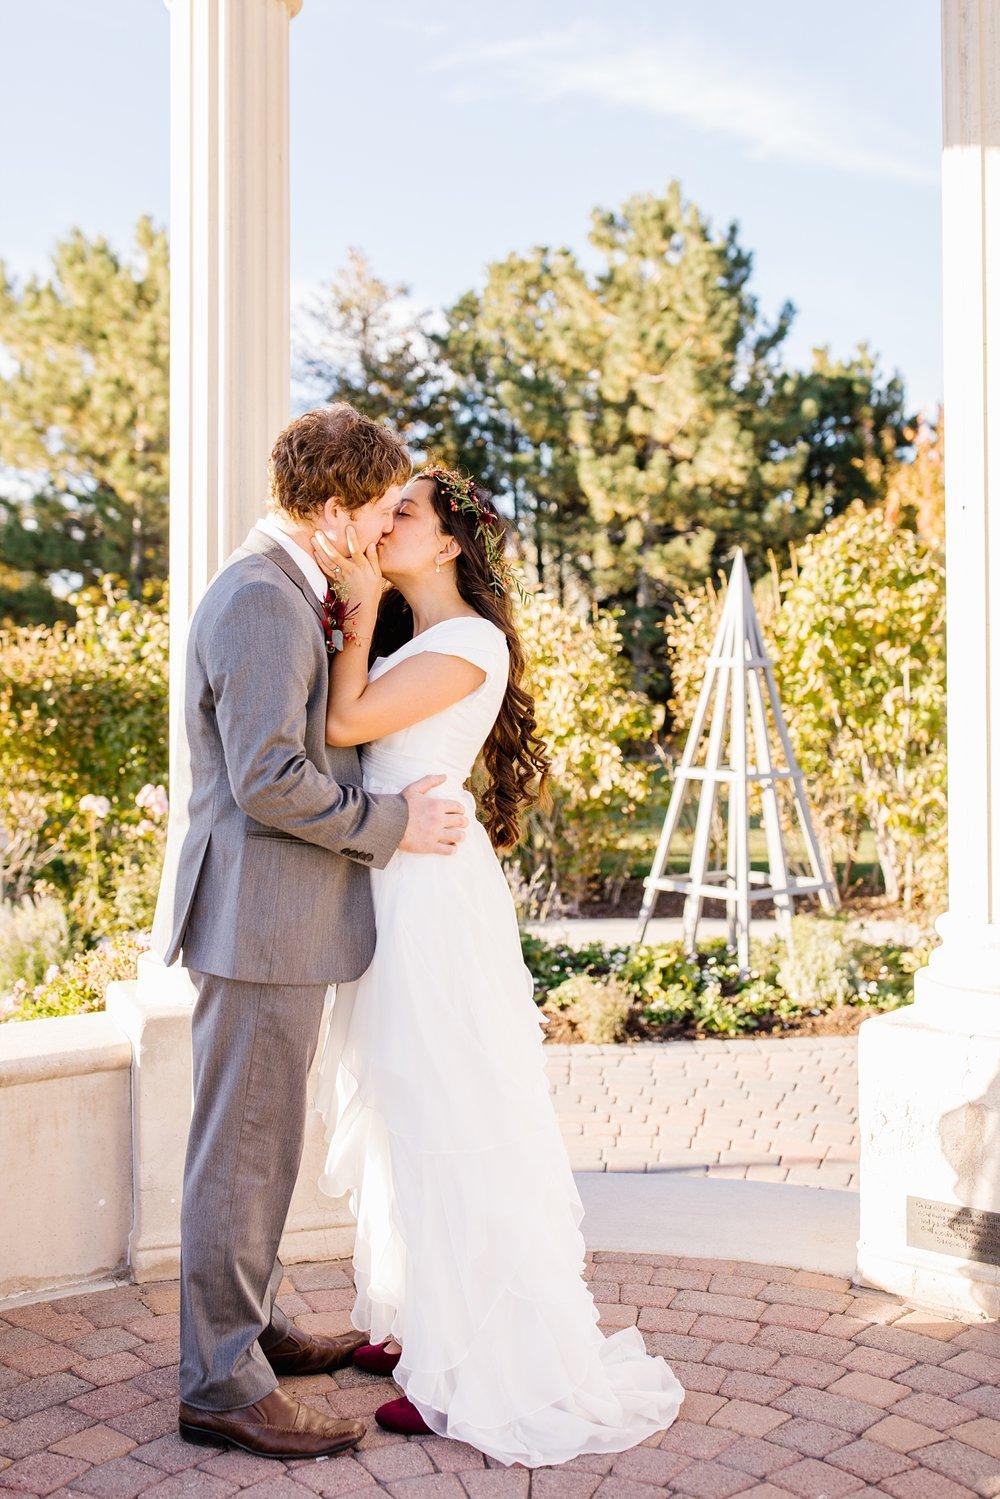 JB-Bridals-59_Lizzie-B-Imagery-Utah-Wedding-Photographer-Thanksgiving-Point-Ashton-Gardens-Lehi-Utah.jpg